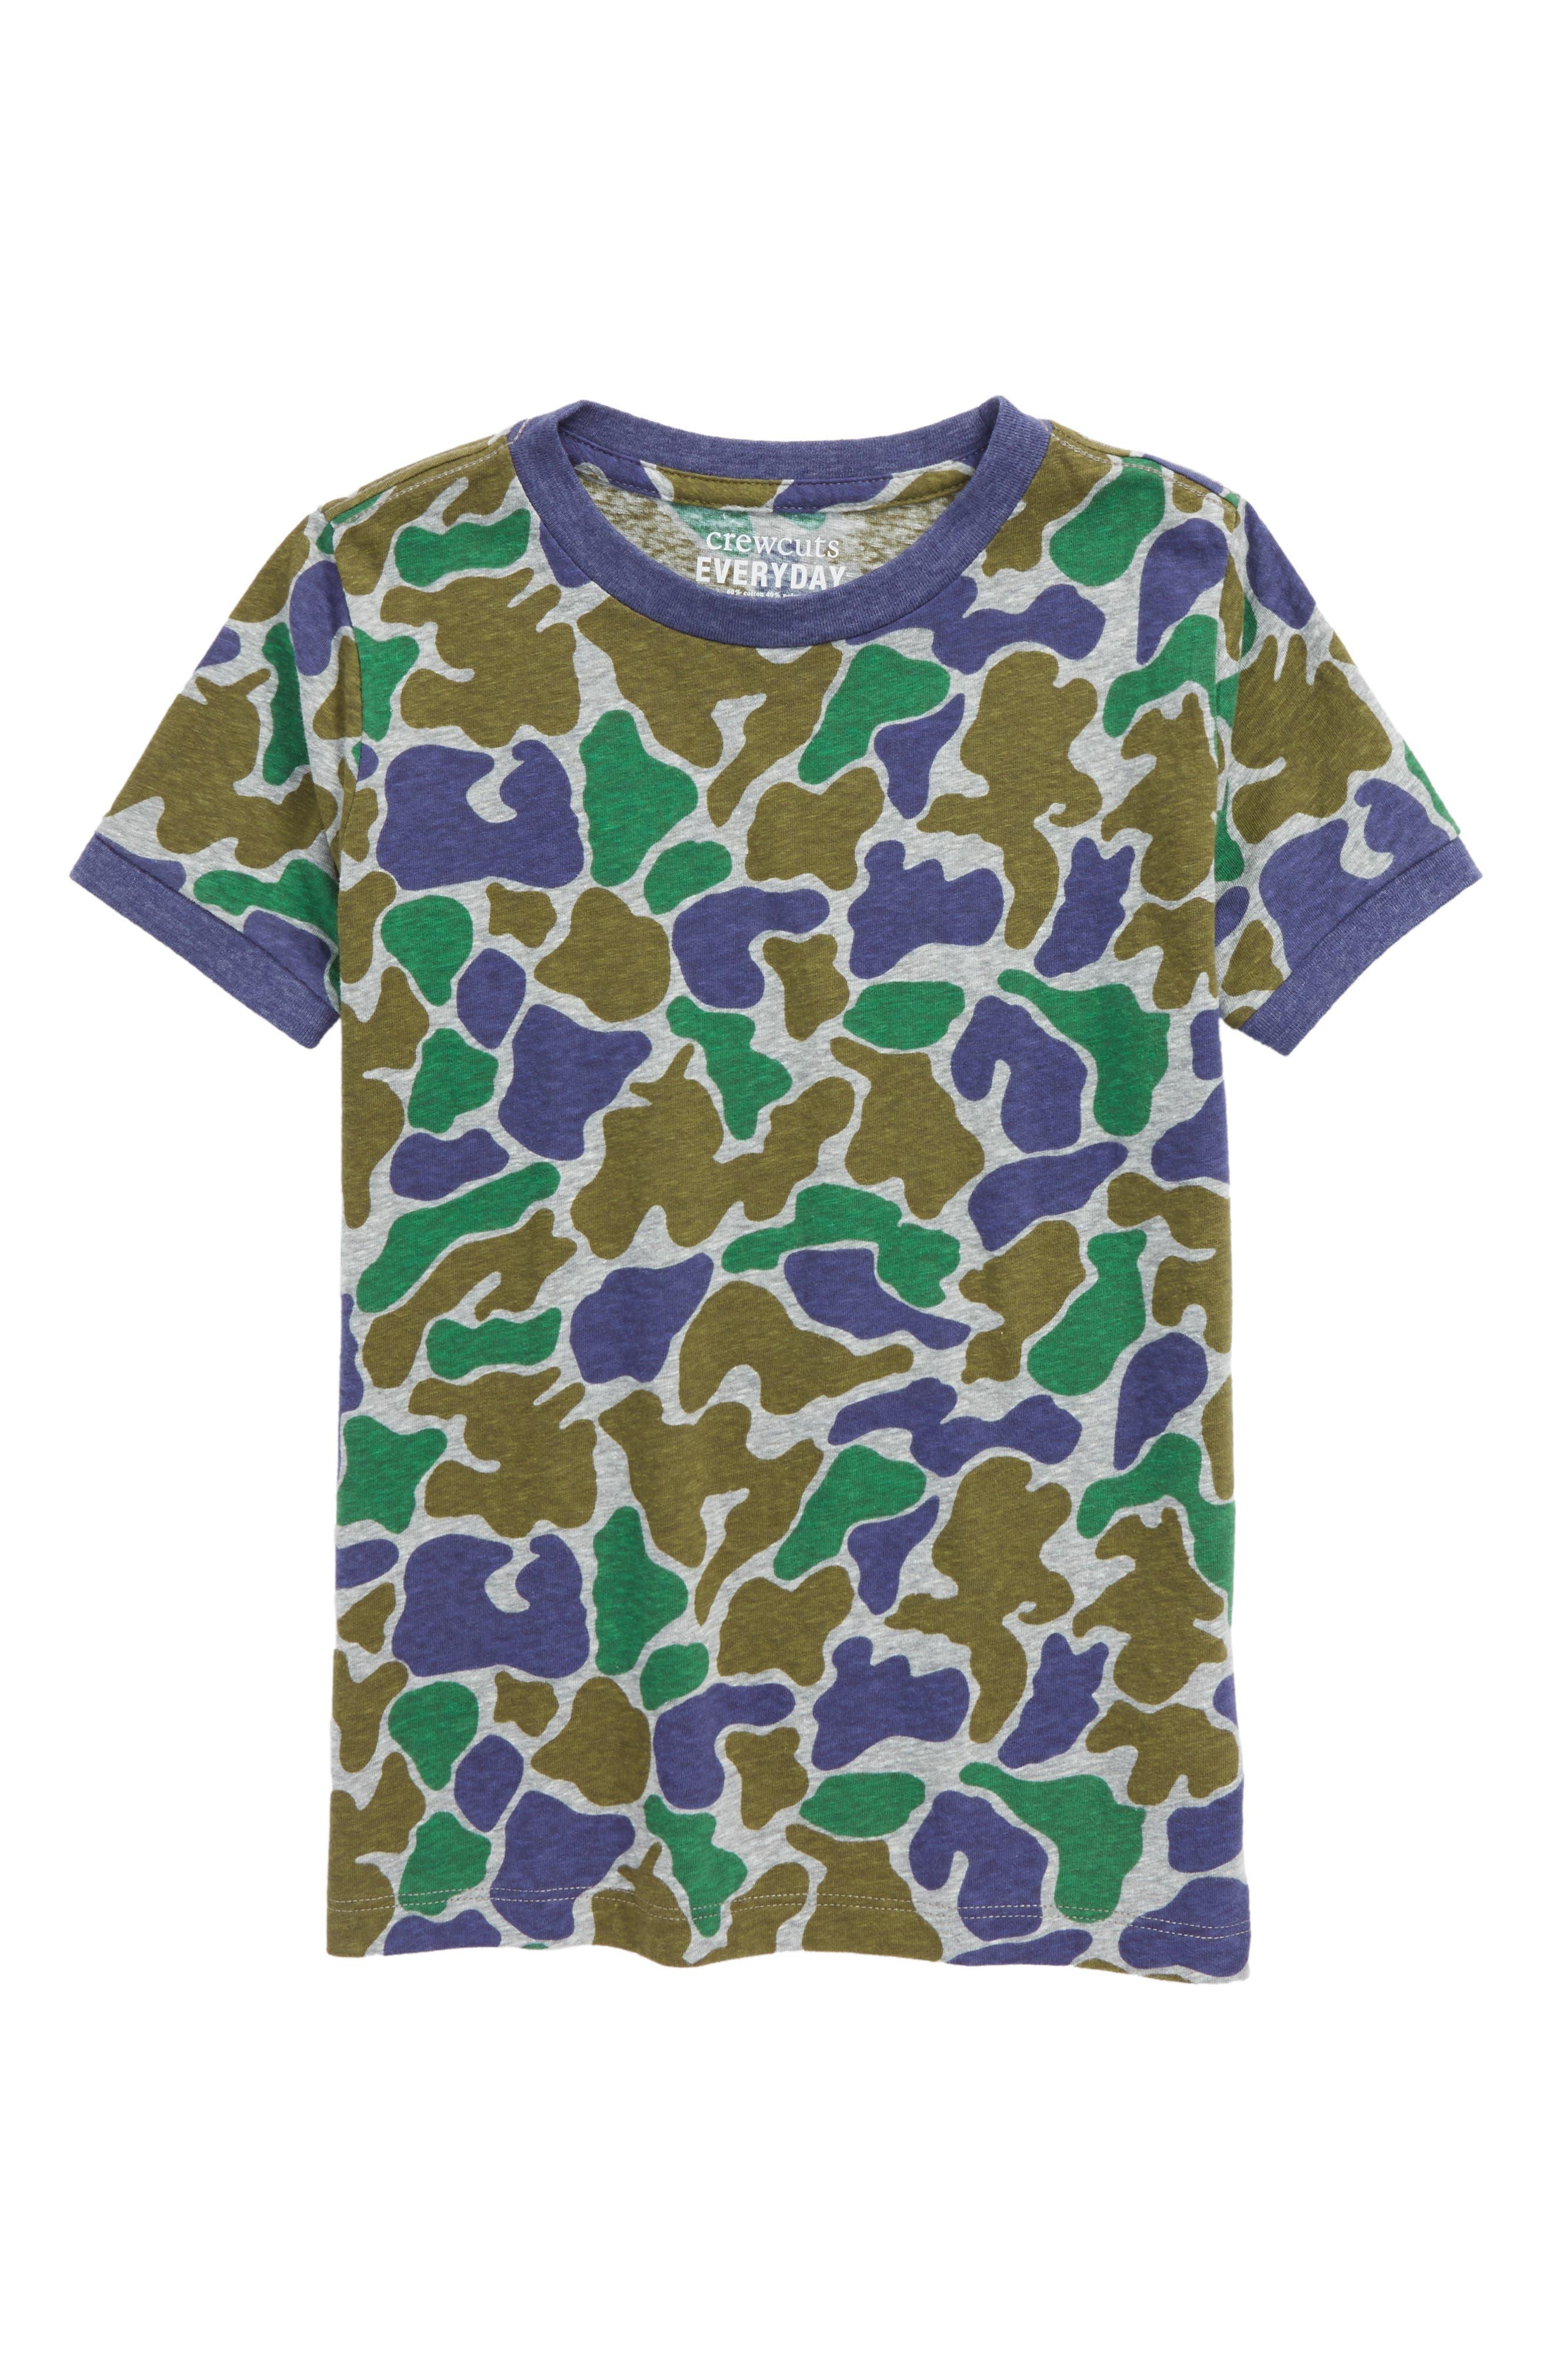 CREWCUTS BY J.CREW Camo T-Shirt, Main, color, 020